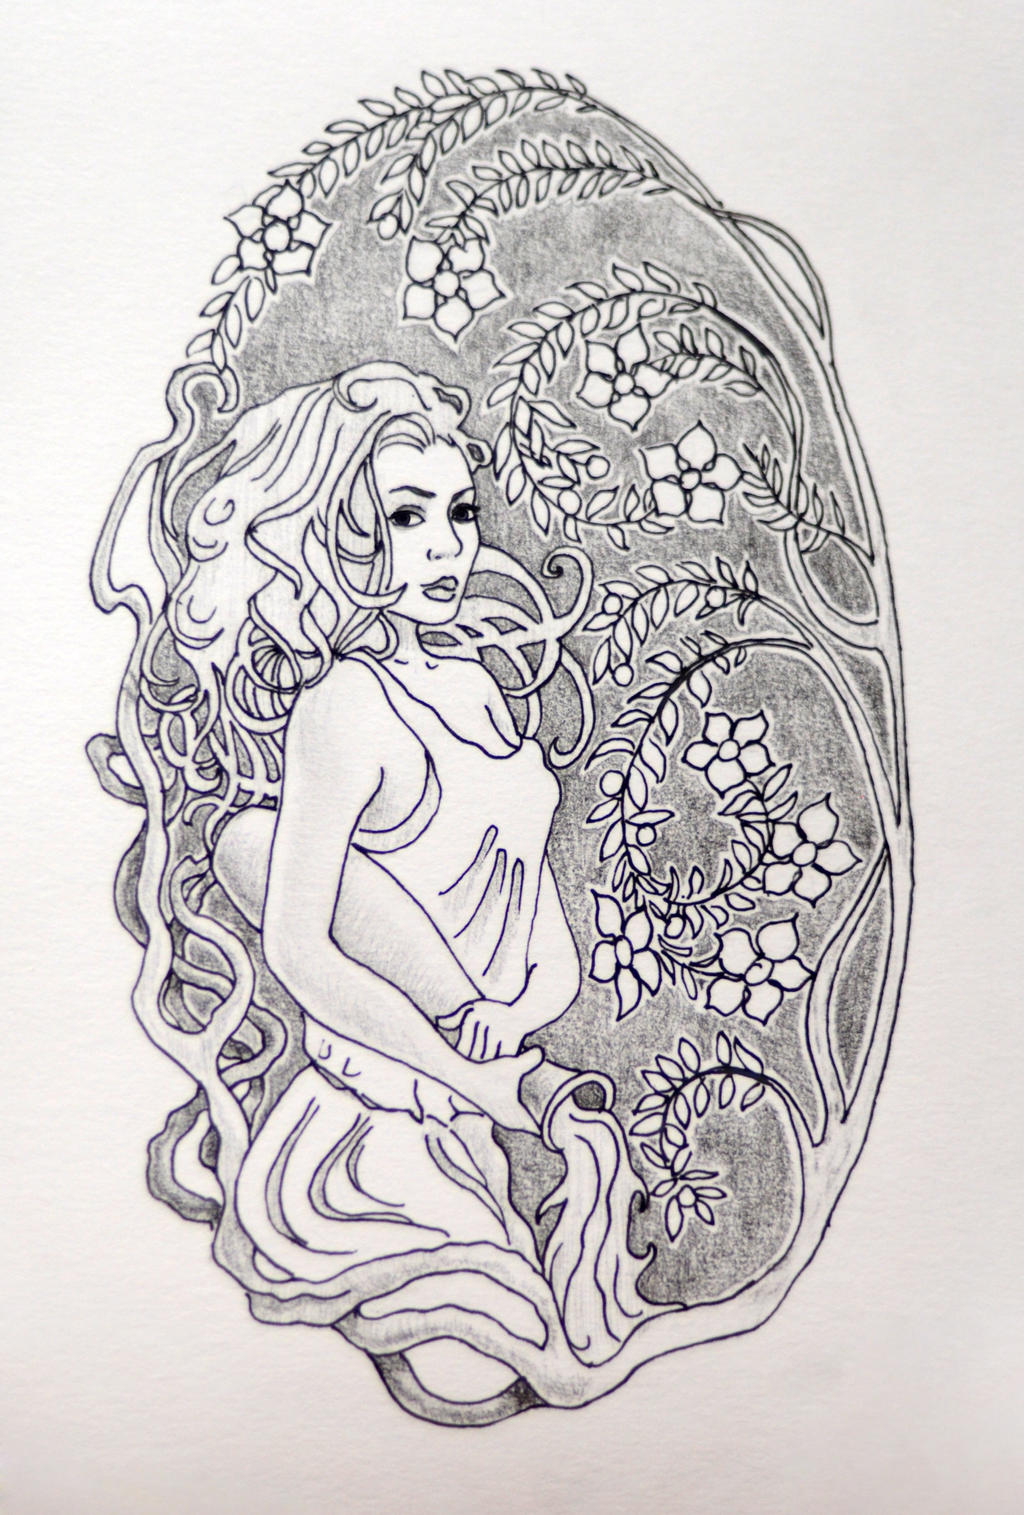 Aquarius tattoo sketch by Nelsonito